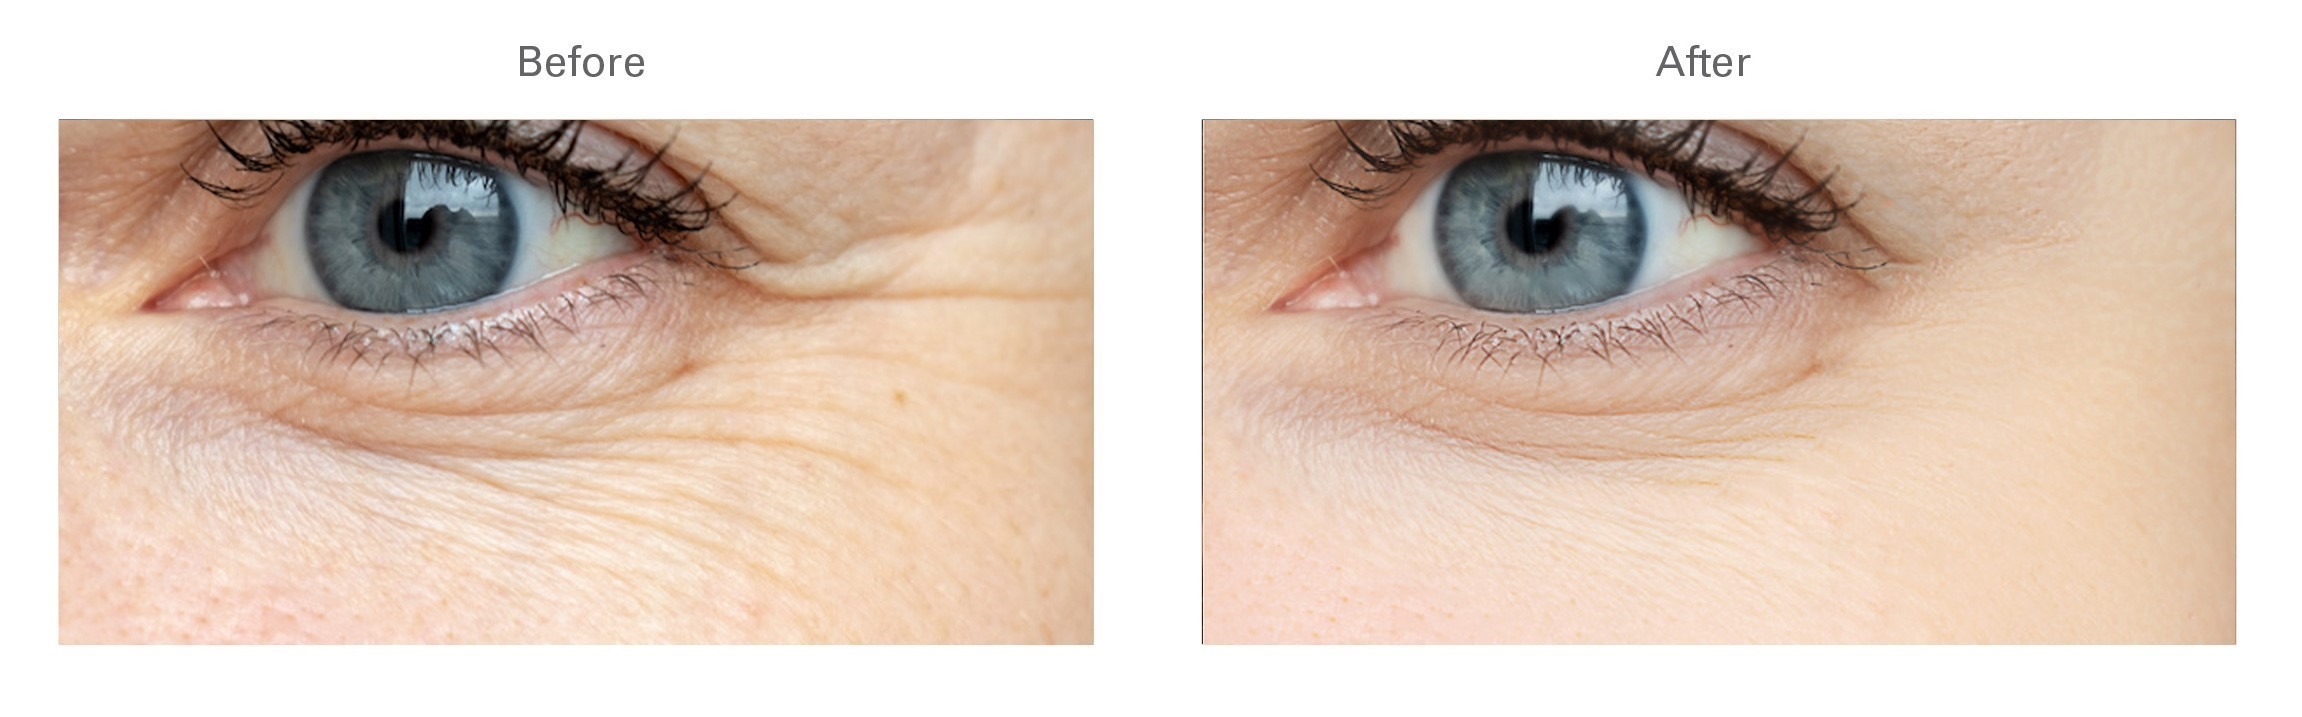 Botox® for Botox Under Eye